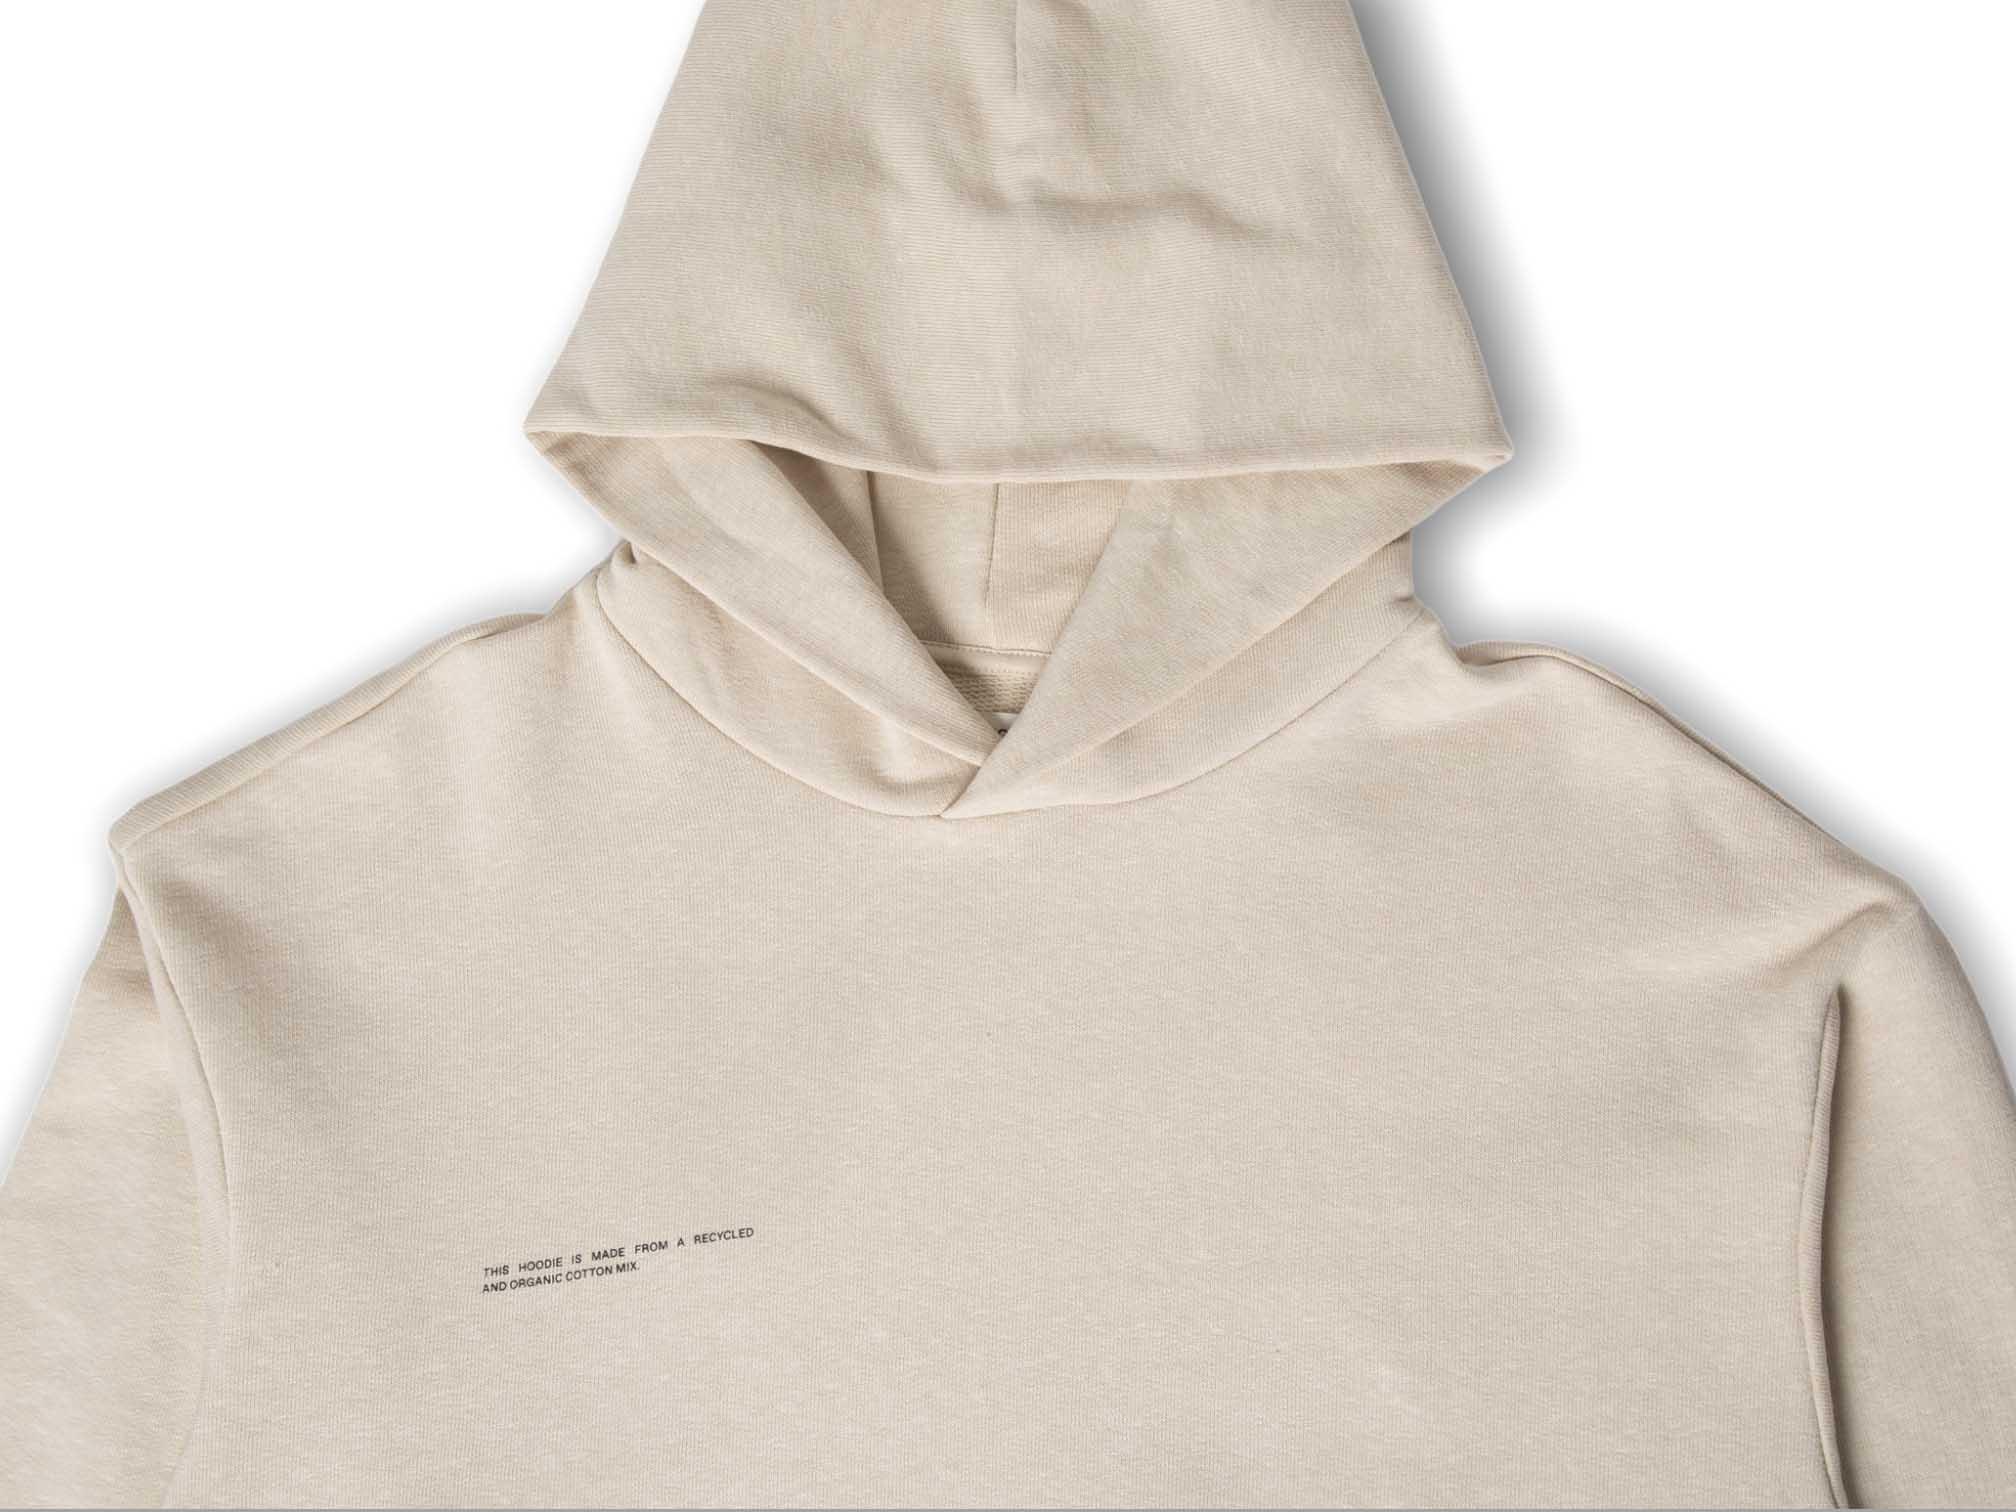 slide 2 - Heavyweight Cotton Hoodie - Sand